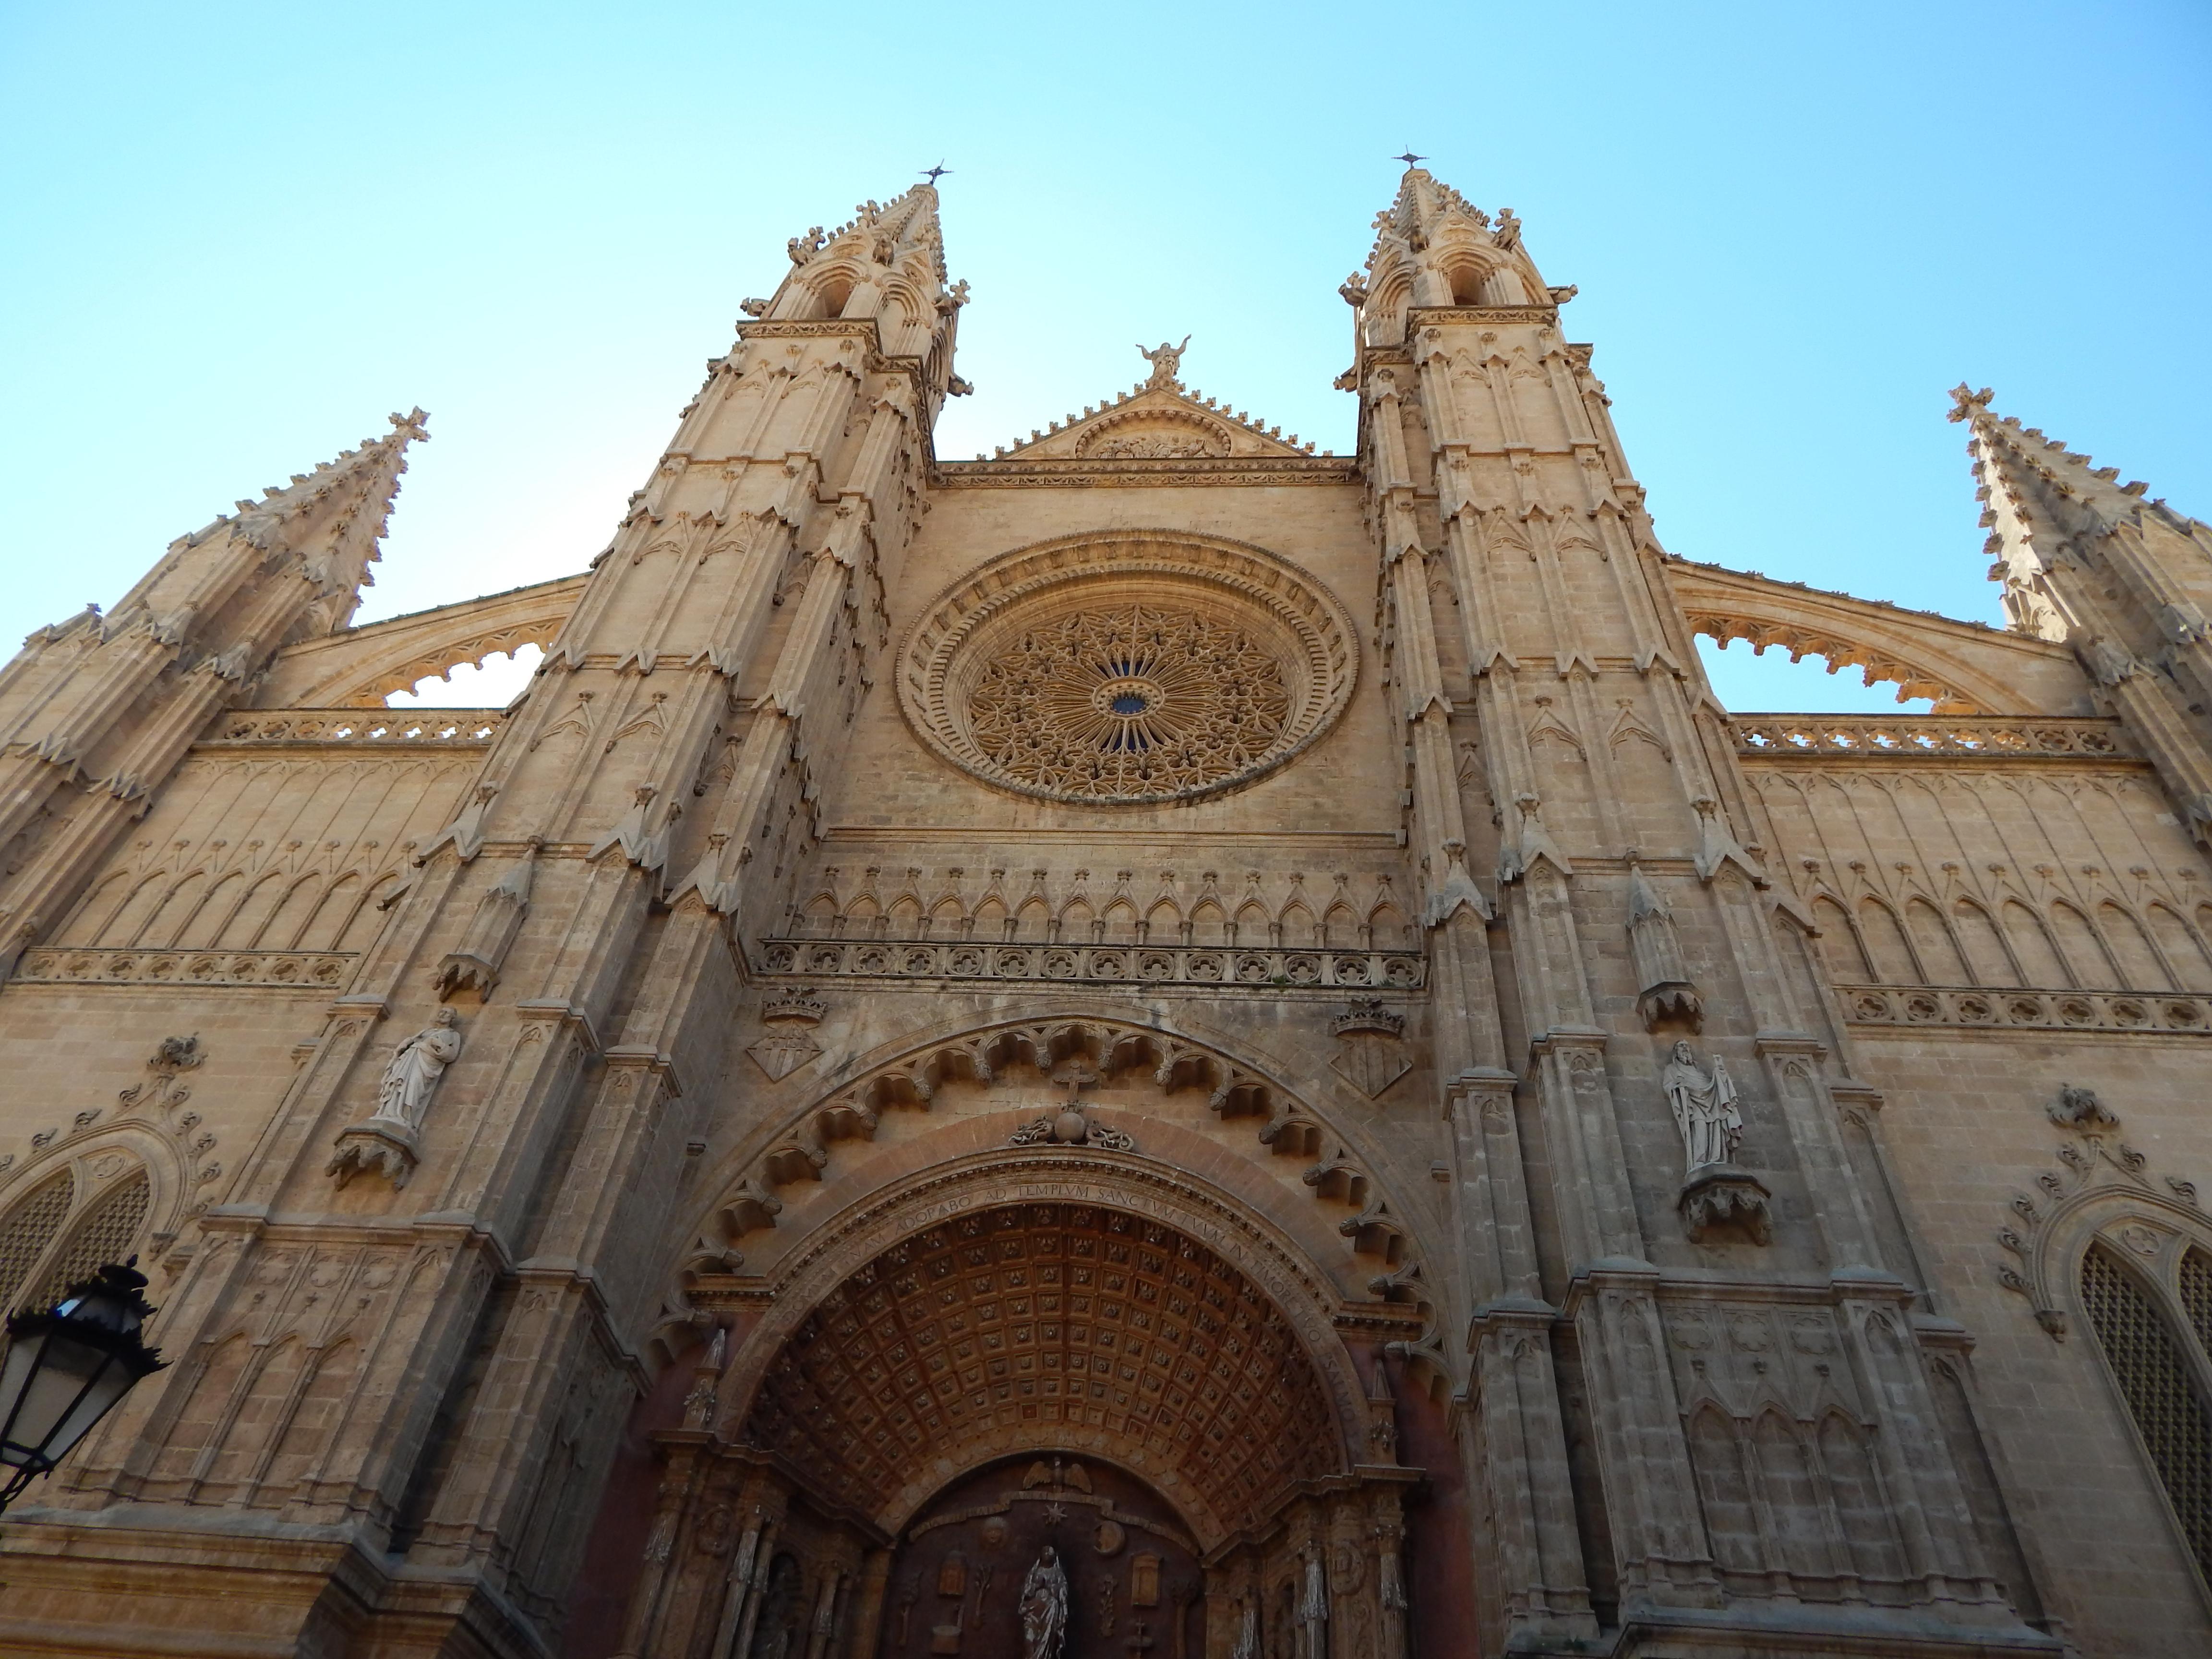 Catedral de Mallorca y castillo de bellver